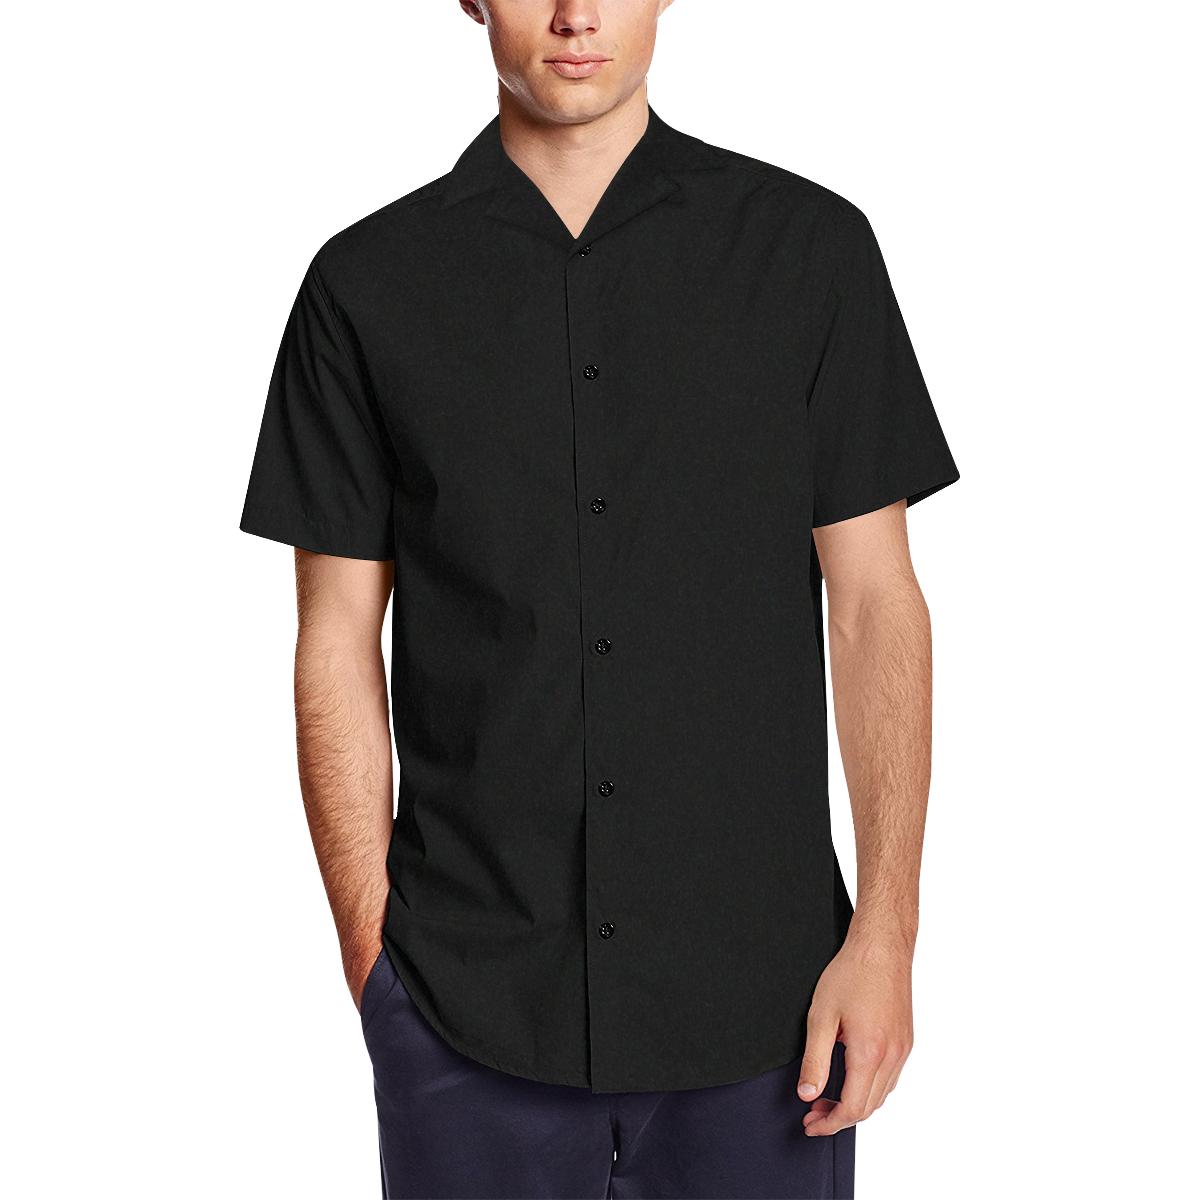 Dark Gothic Demon Black Satin Dress Shirt Men Plaid Dress Shirt Men Satin Shirt Dress Mens Shirt Dress [ 1200 x 1200 Pixel ]